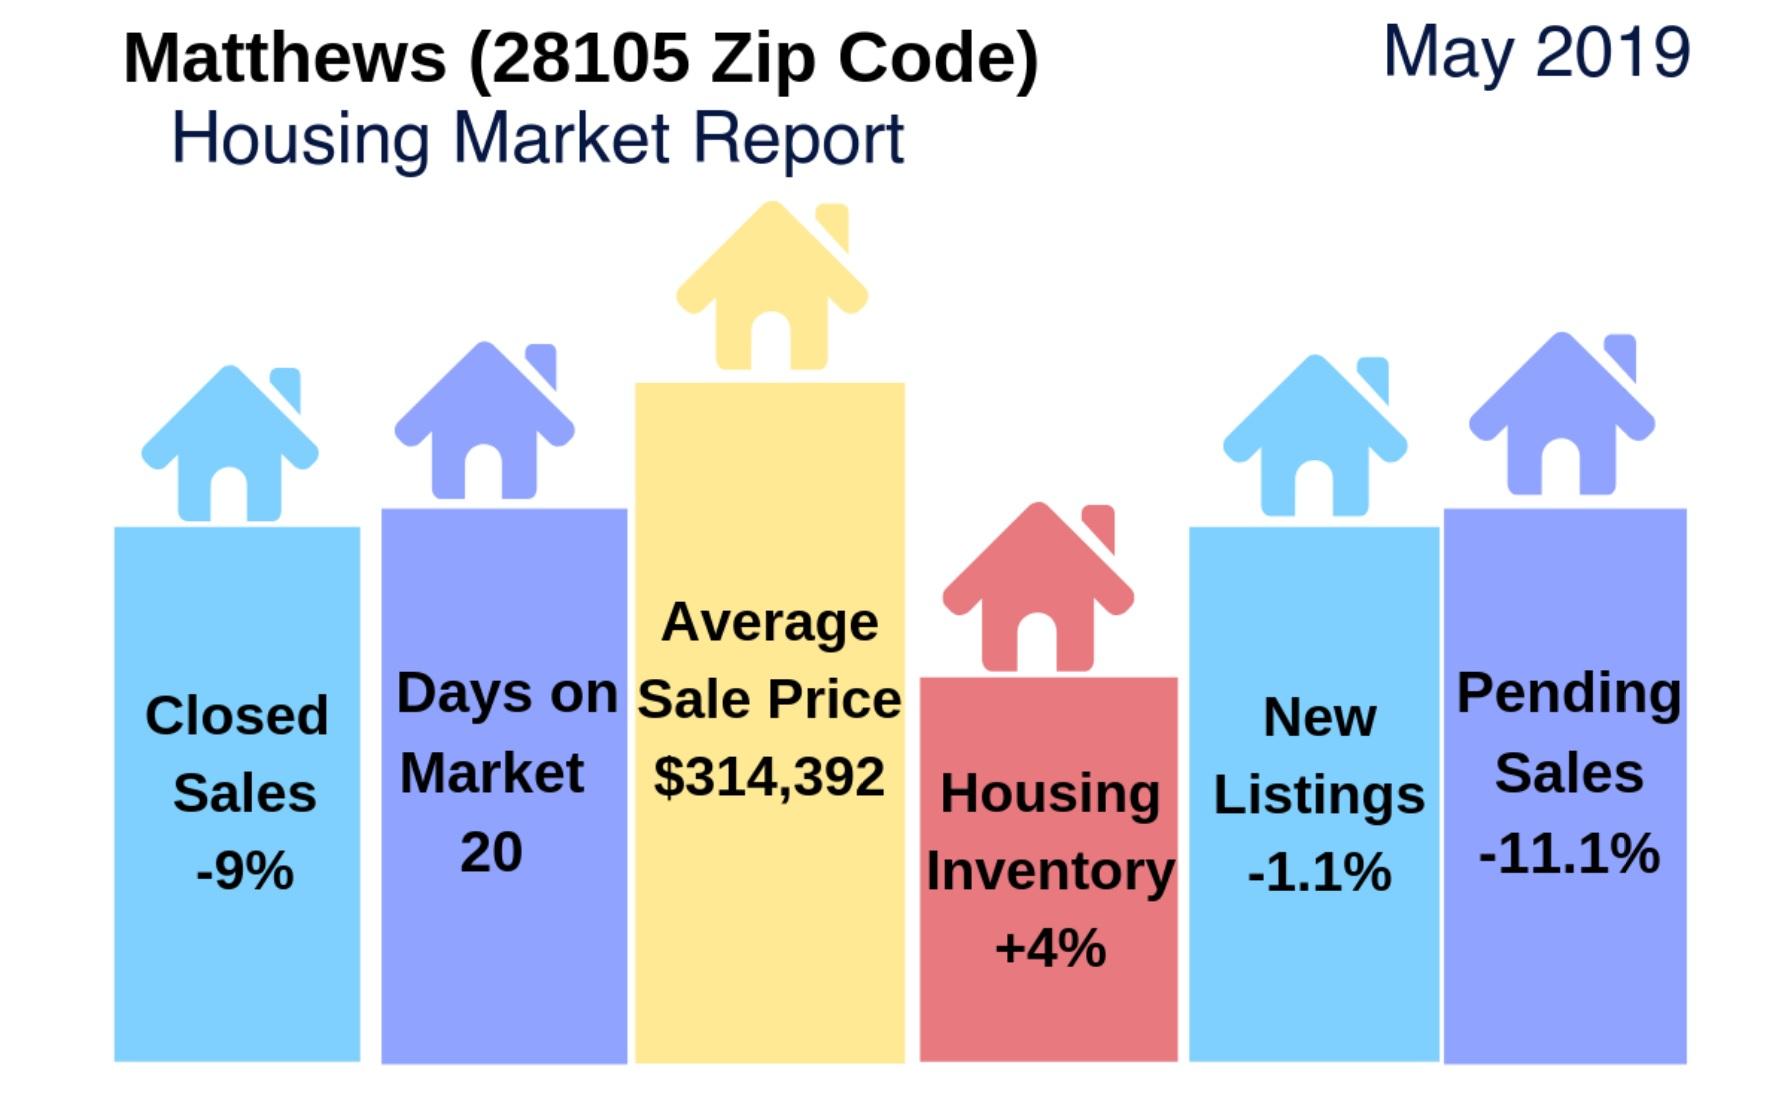 Matthews, NC (28105 Zip Code) Housing Market Update & Video: April 2019